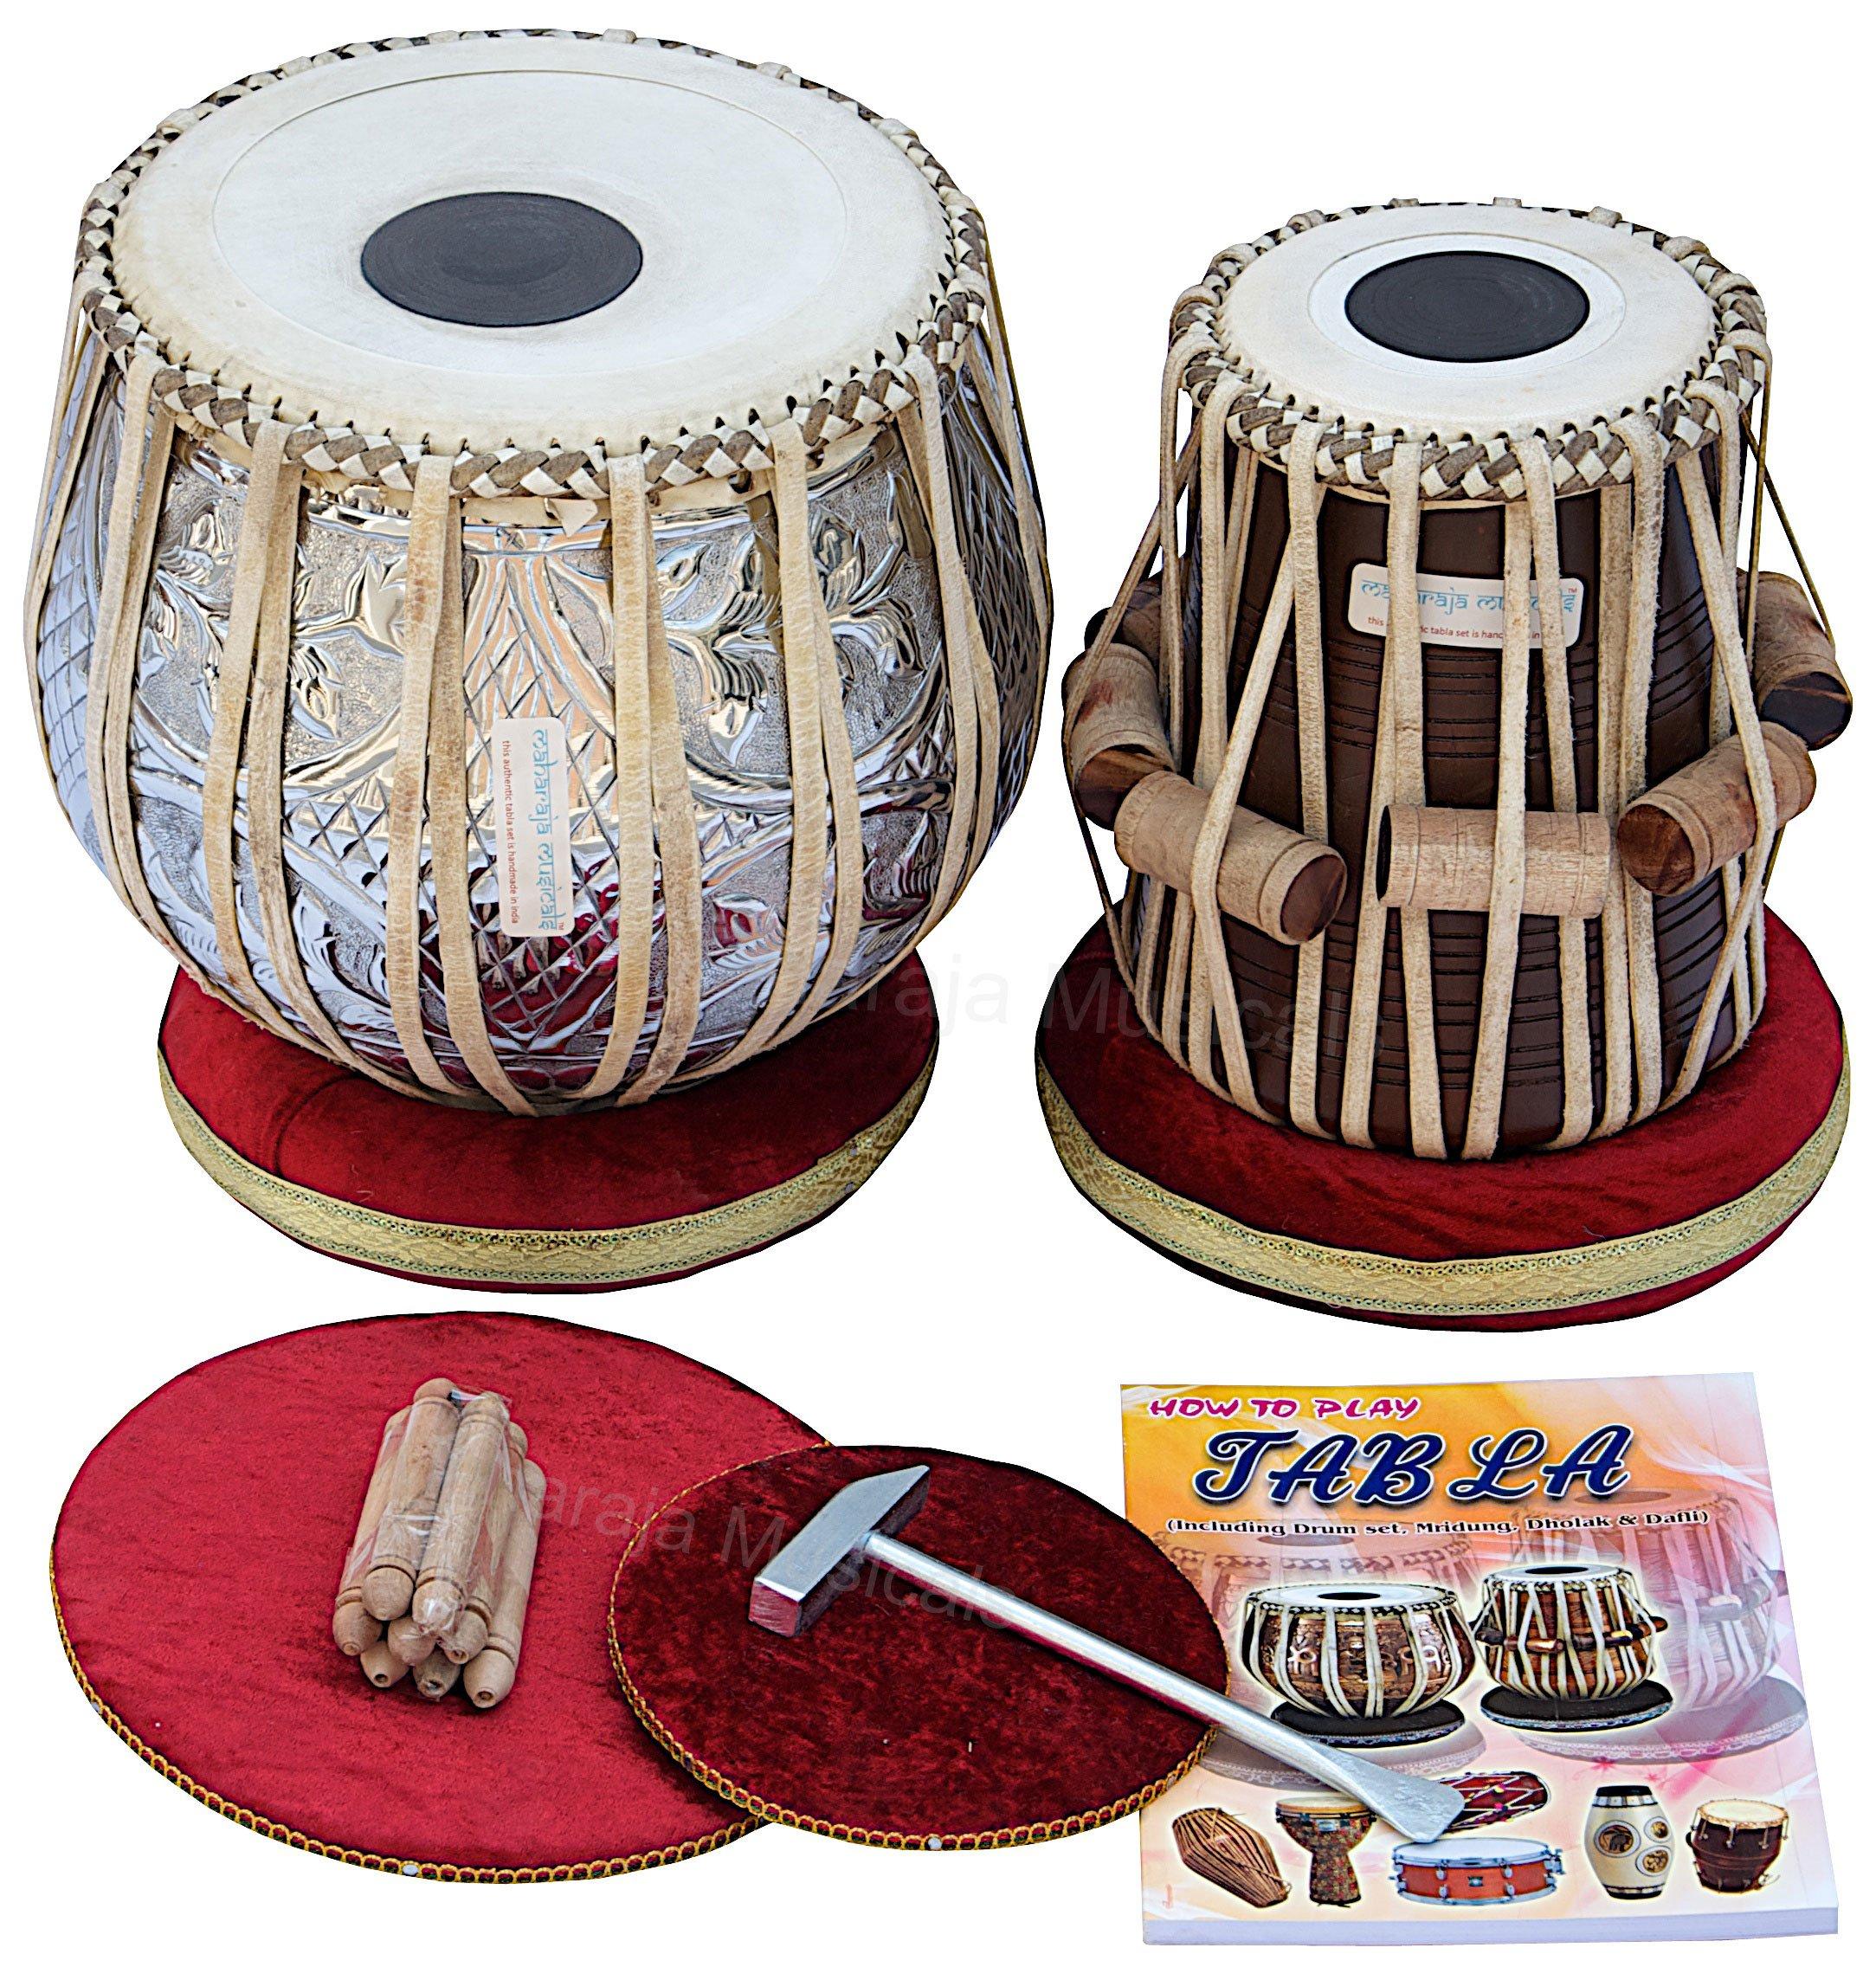 MAHARAJA Concert Tabla Drum Set, 4½ Kg Copper Bayan, Designer, Finest Dayan with Padded Bag, Book, Hammer, Cushions & Cover - Tabla Set Tabla Drums Tablas Indian Musical Instruments (PDI-69) by Maharaja Musicals